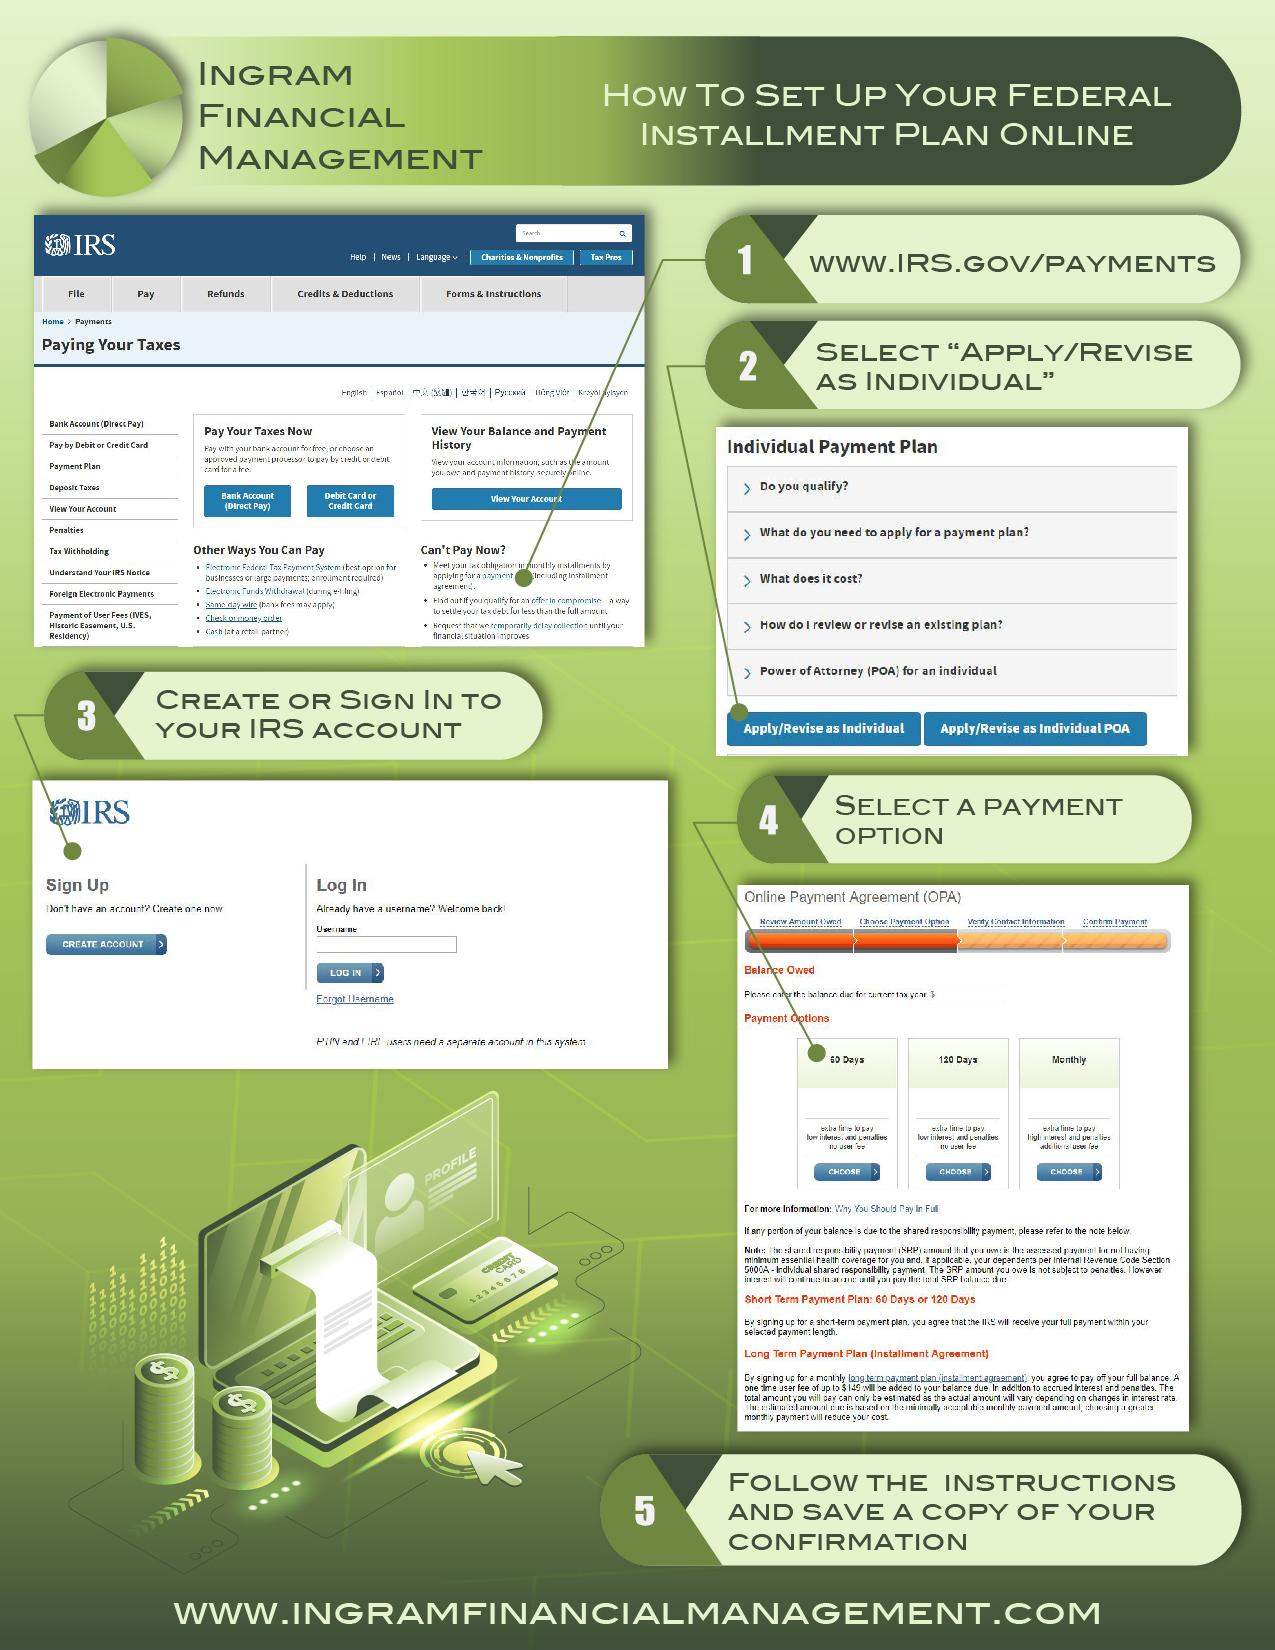 Ingram Financial Management Set Up Installment Plan Online